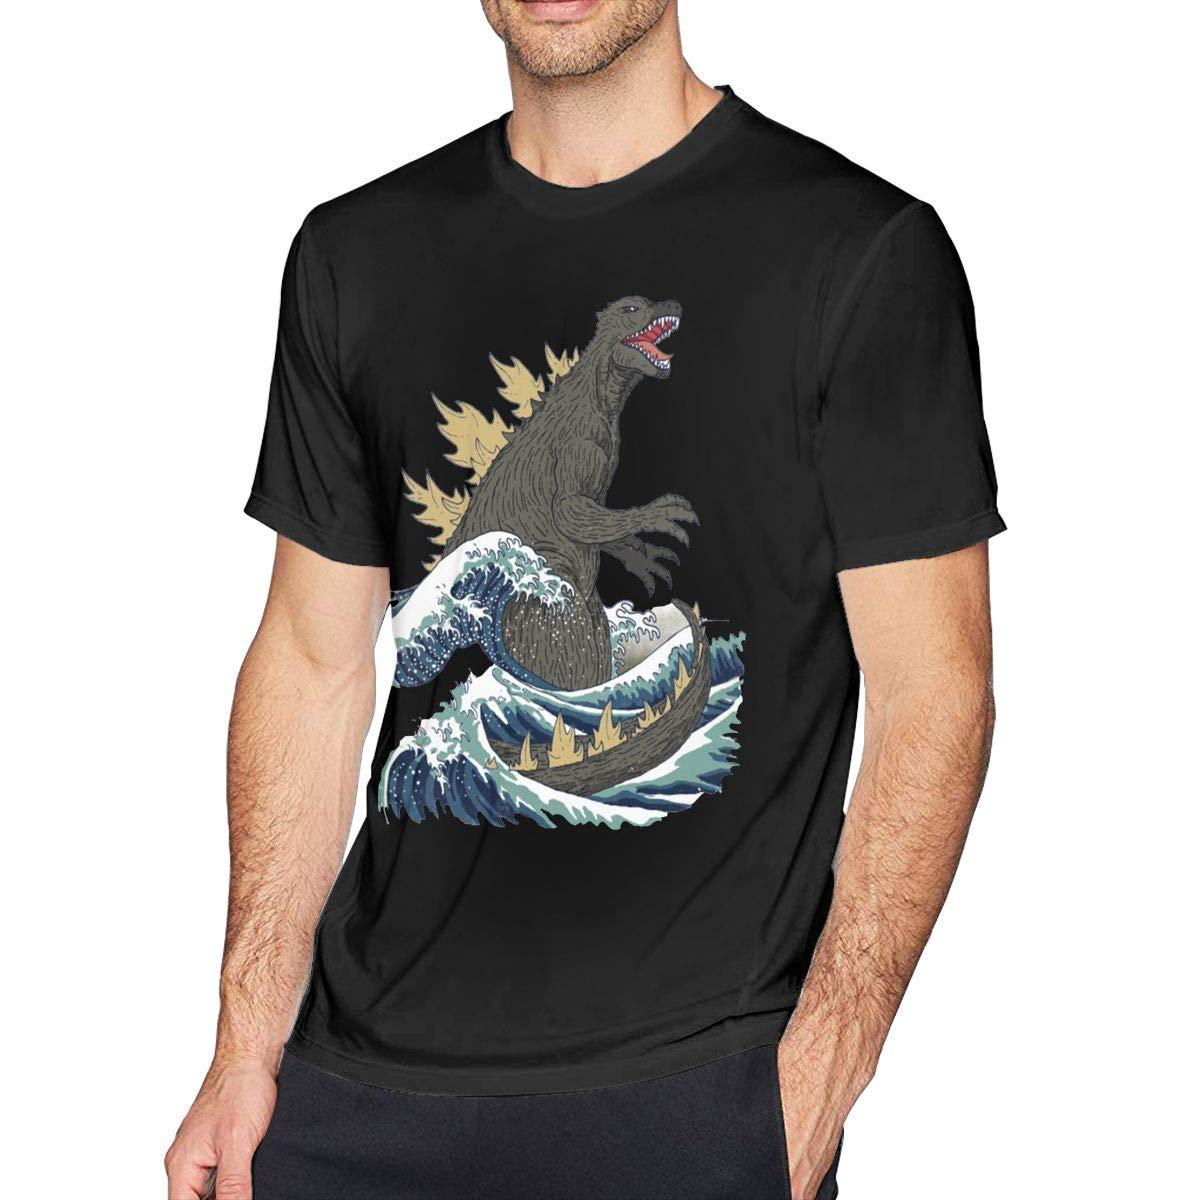 Slaoero The Great Godzilla Off Kanagawa S Soft Short Sleeve Tshirt Black